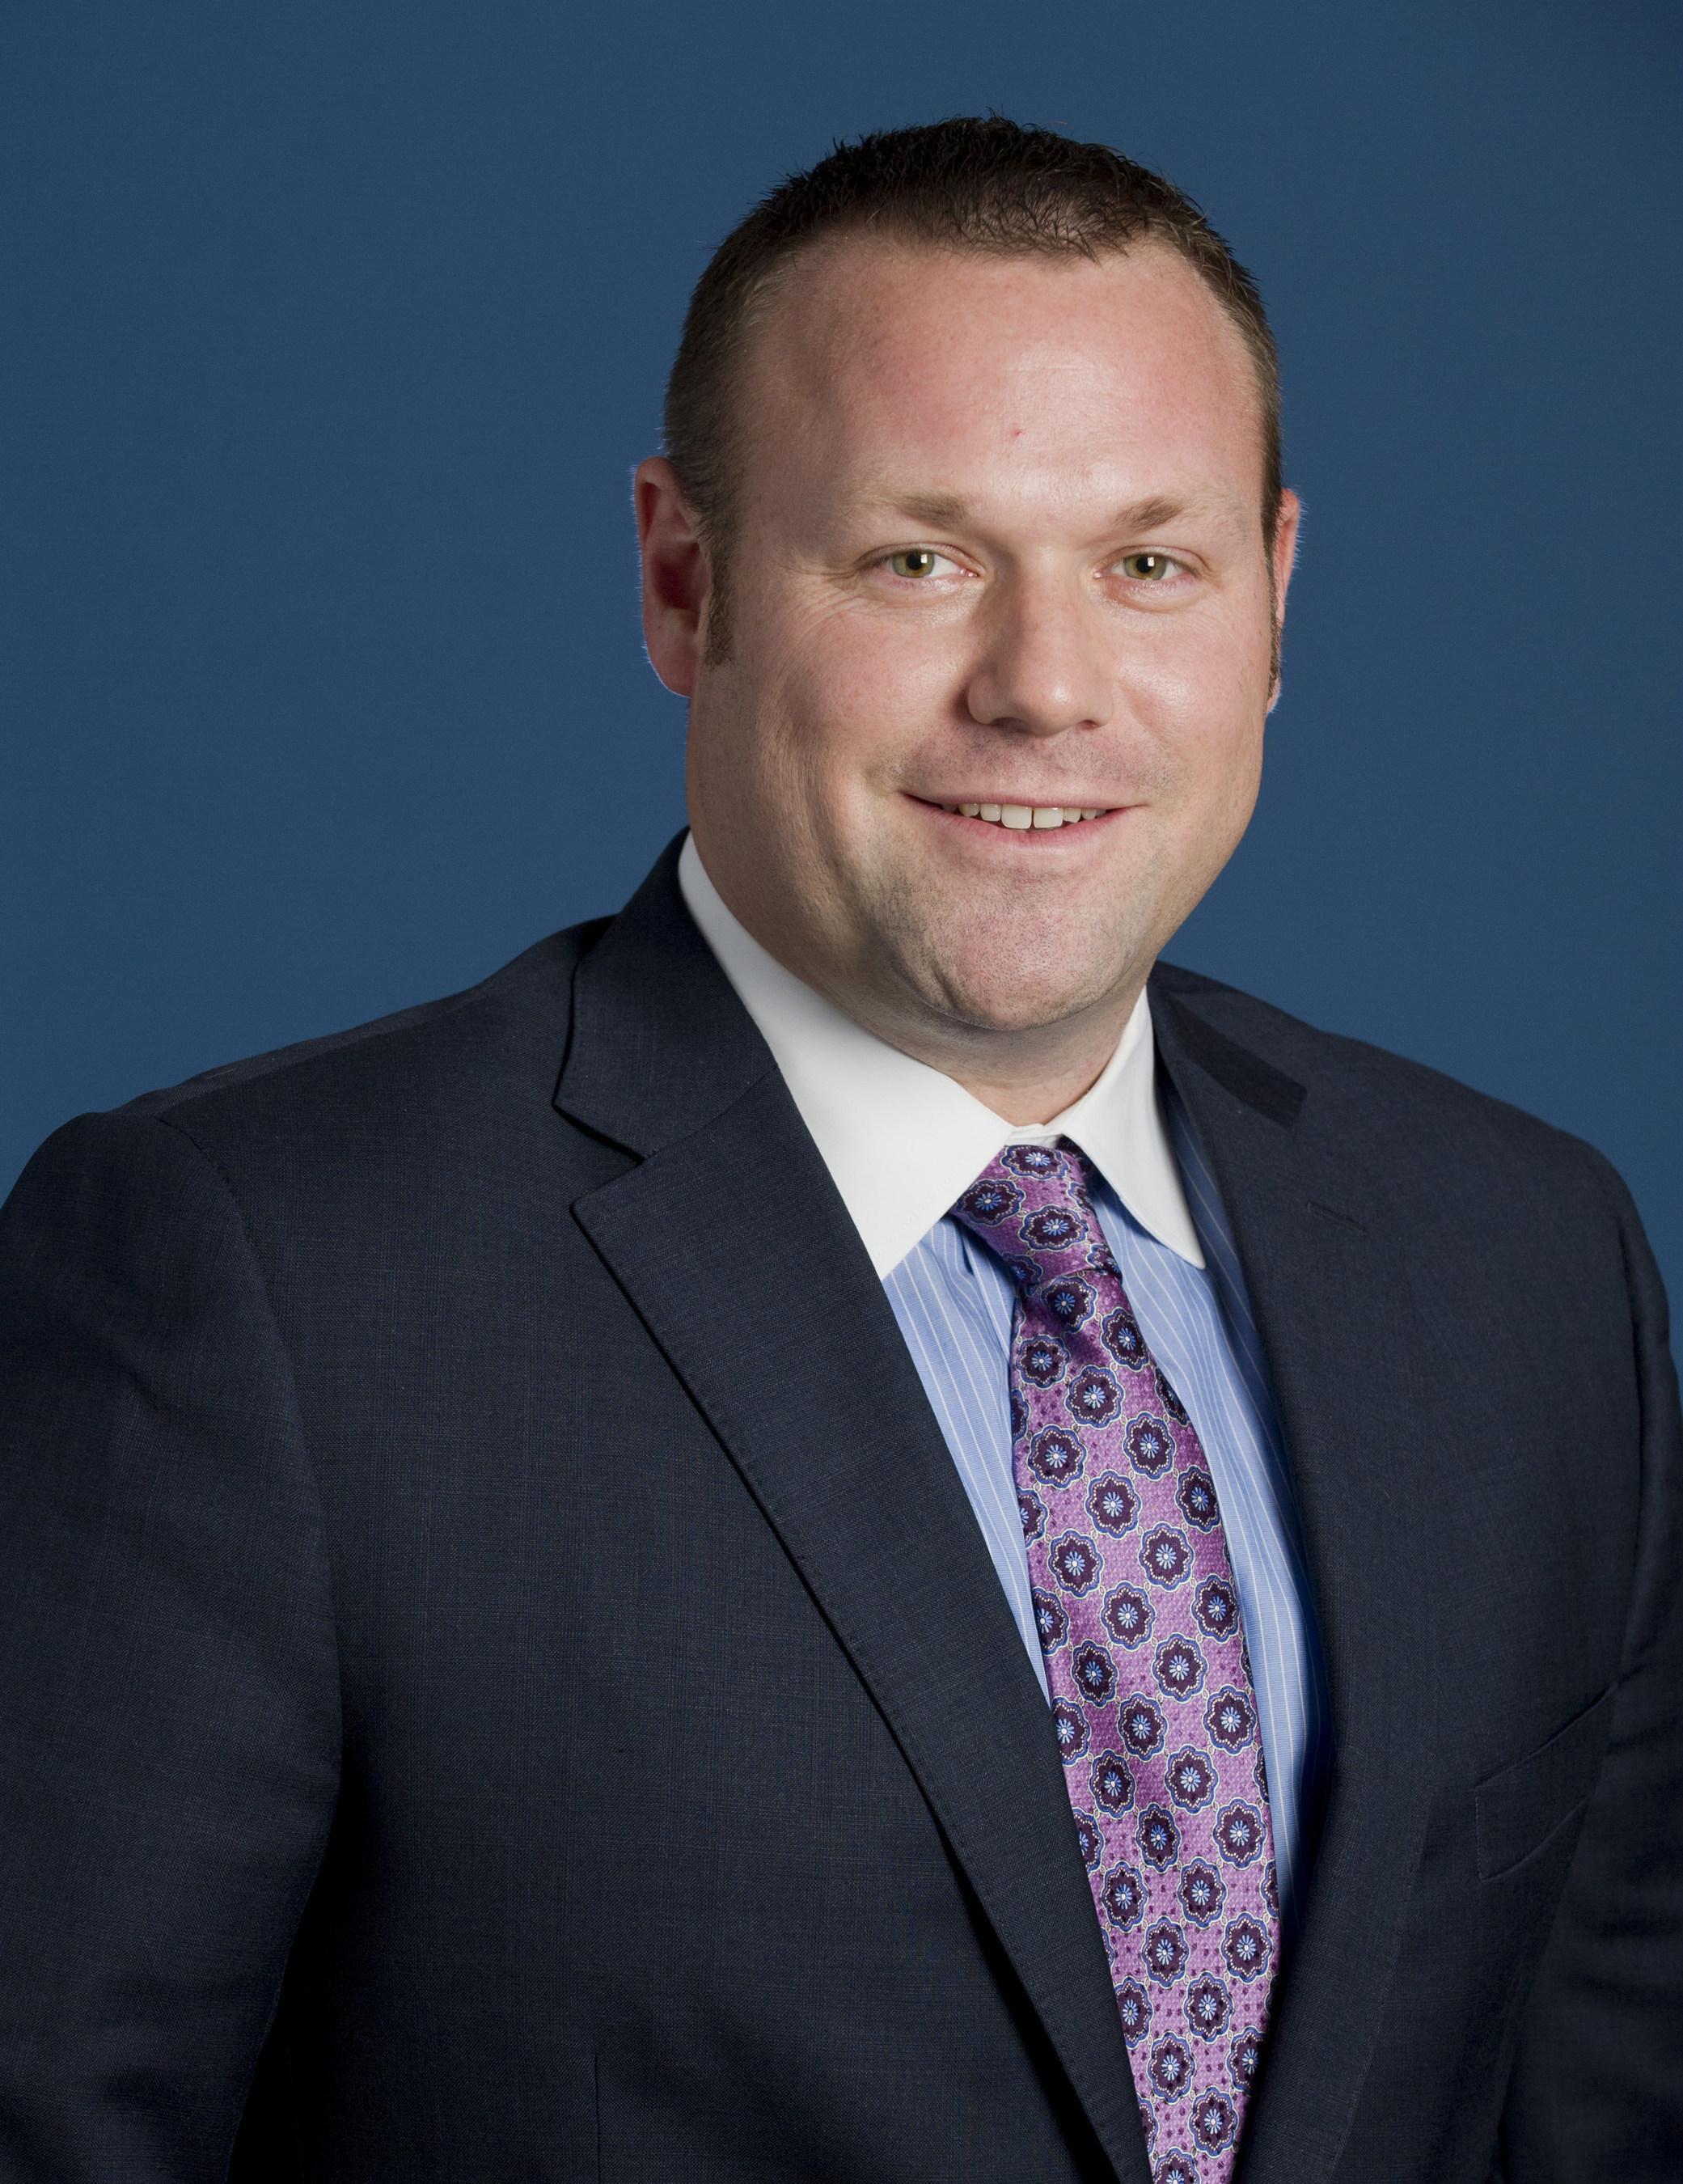 Guy Sheetz, Medifast EVP of Supply Chain